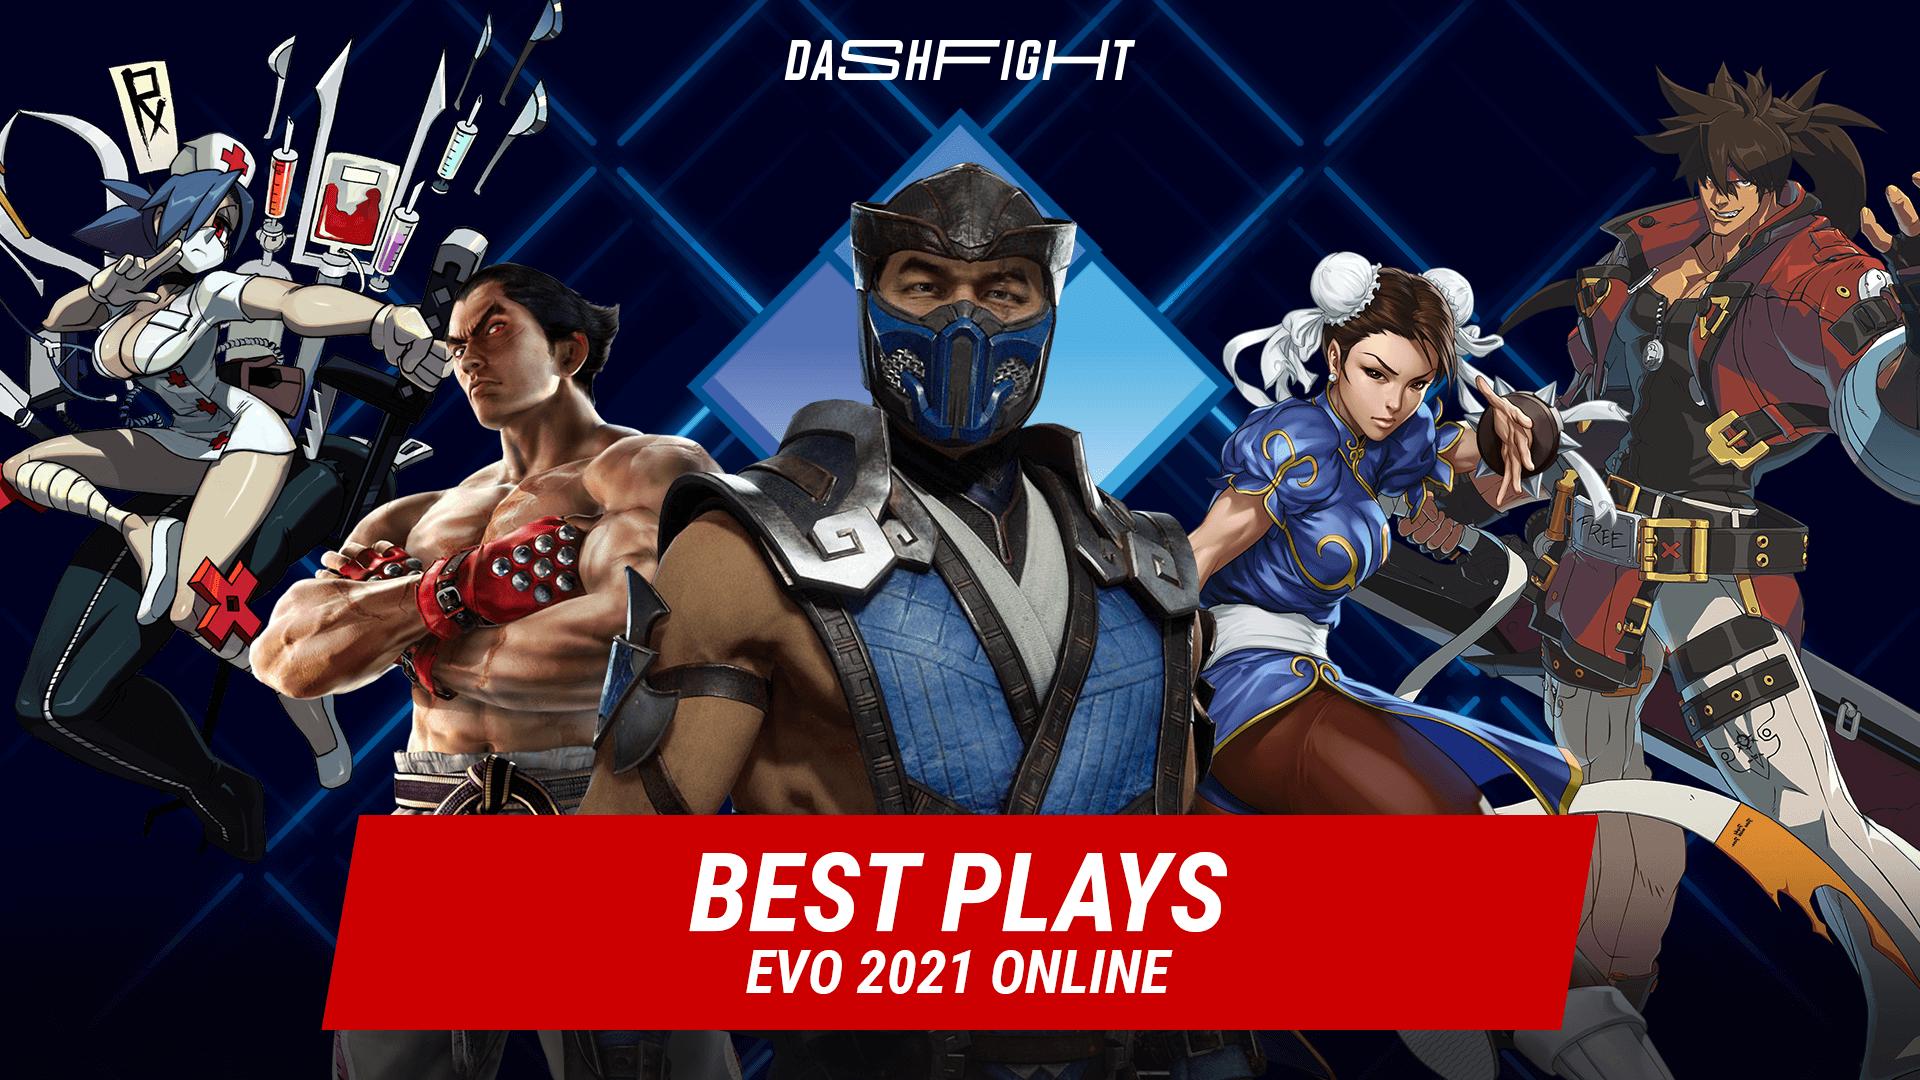 Evo 2021's Best Plays